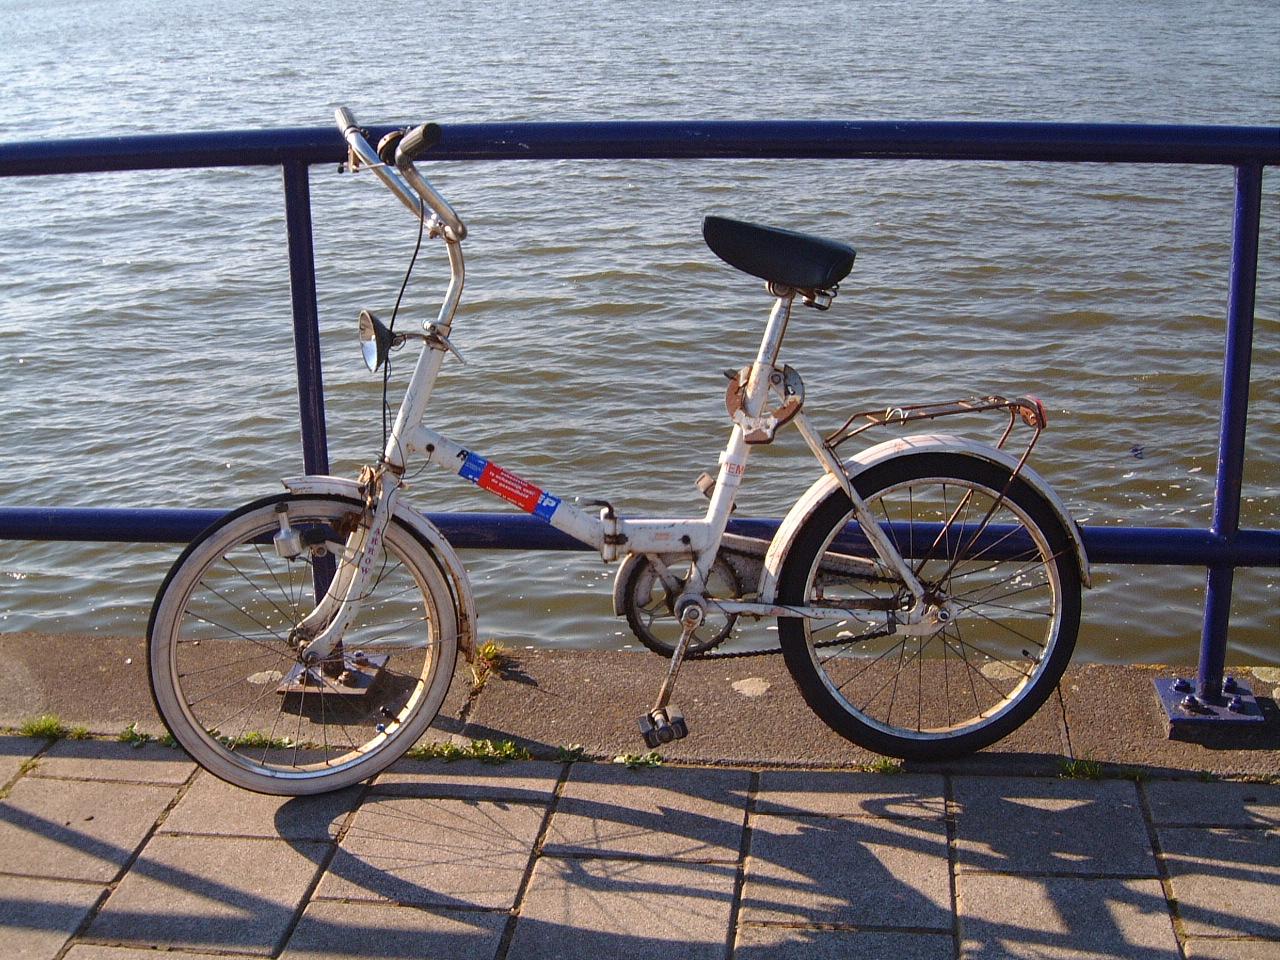 maartent bike bycicle wheels transport cycling saddle small foldup fold up fold-up